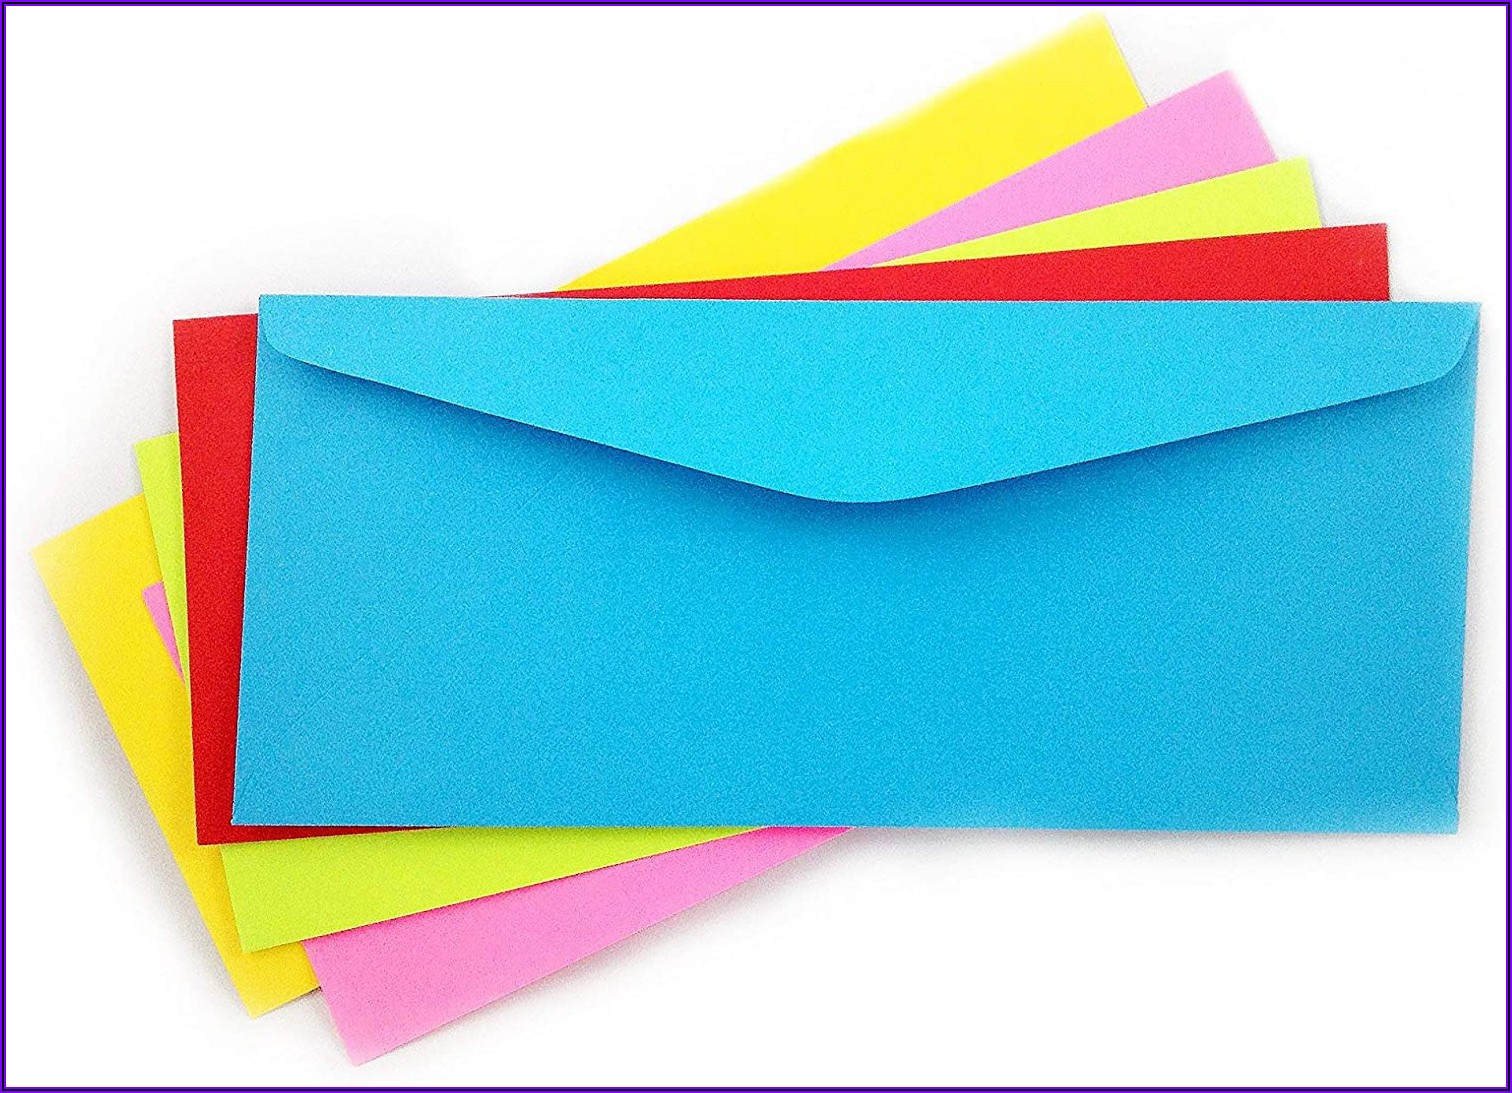 Envelopes #10 Single Left Window Self Seal Security Envelopes 500 Count